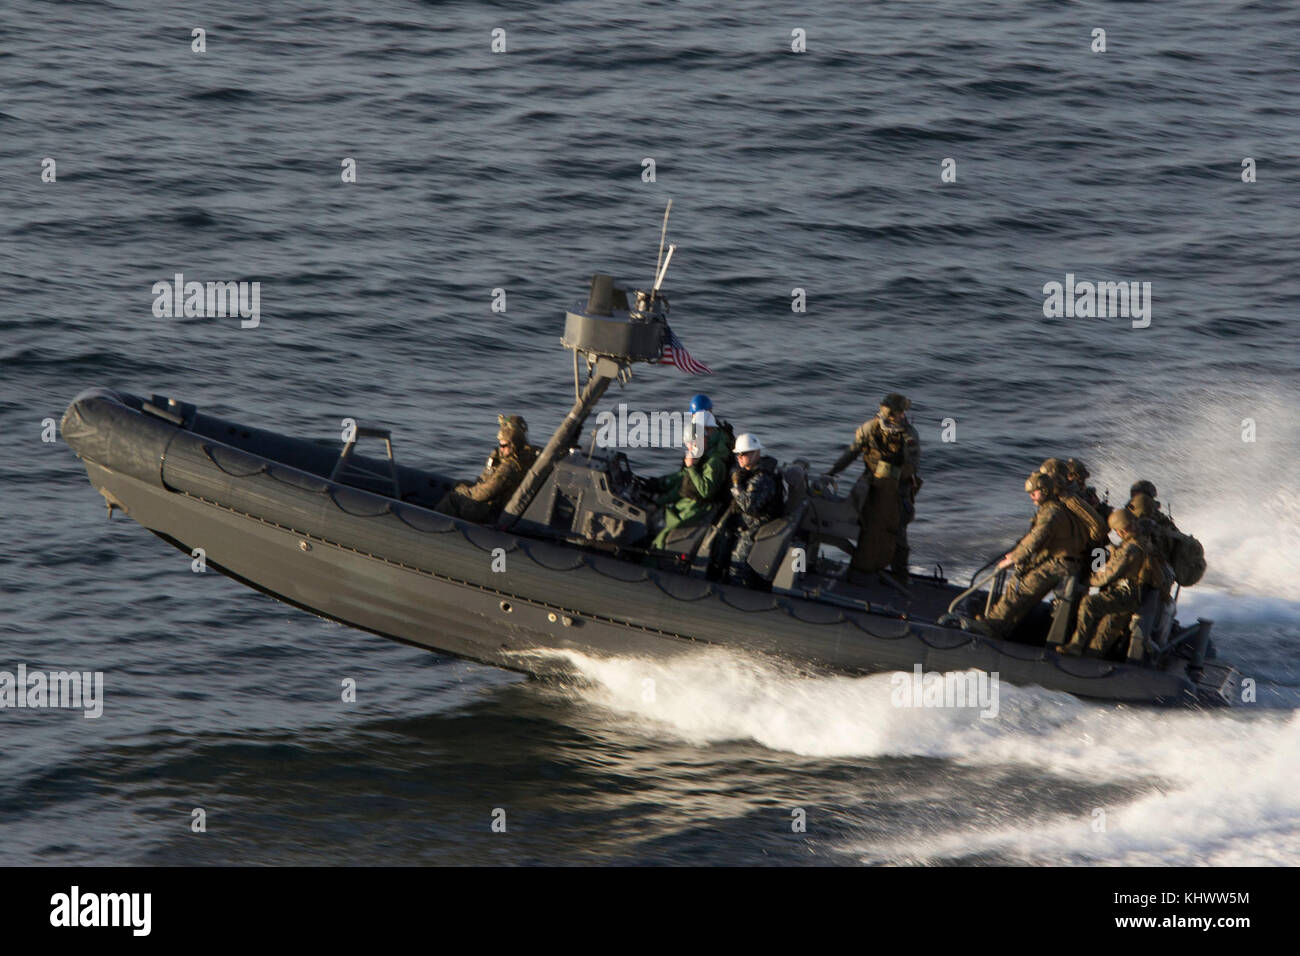 U.S. Marines with the Maritime Raid Force (MRF), 26th Marine Expeditionary Unit (MEU), return from the Training Stock Photo